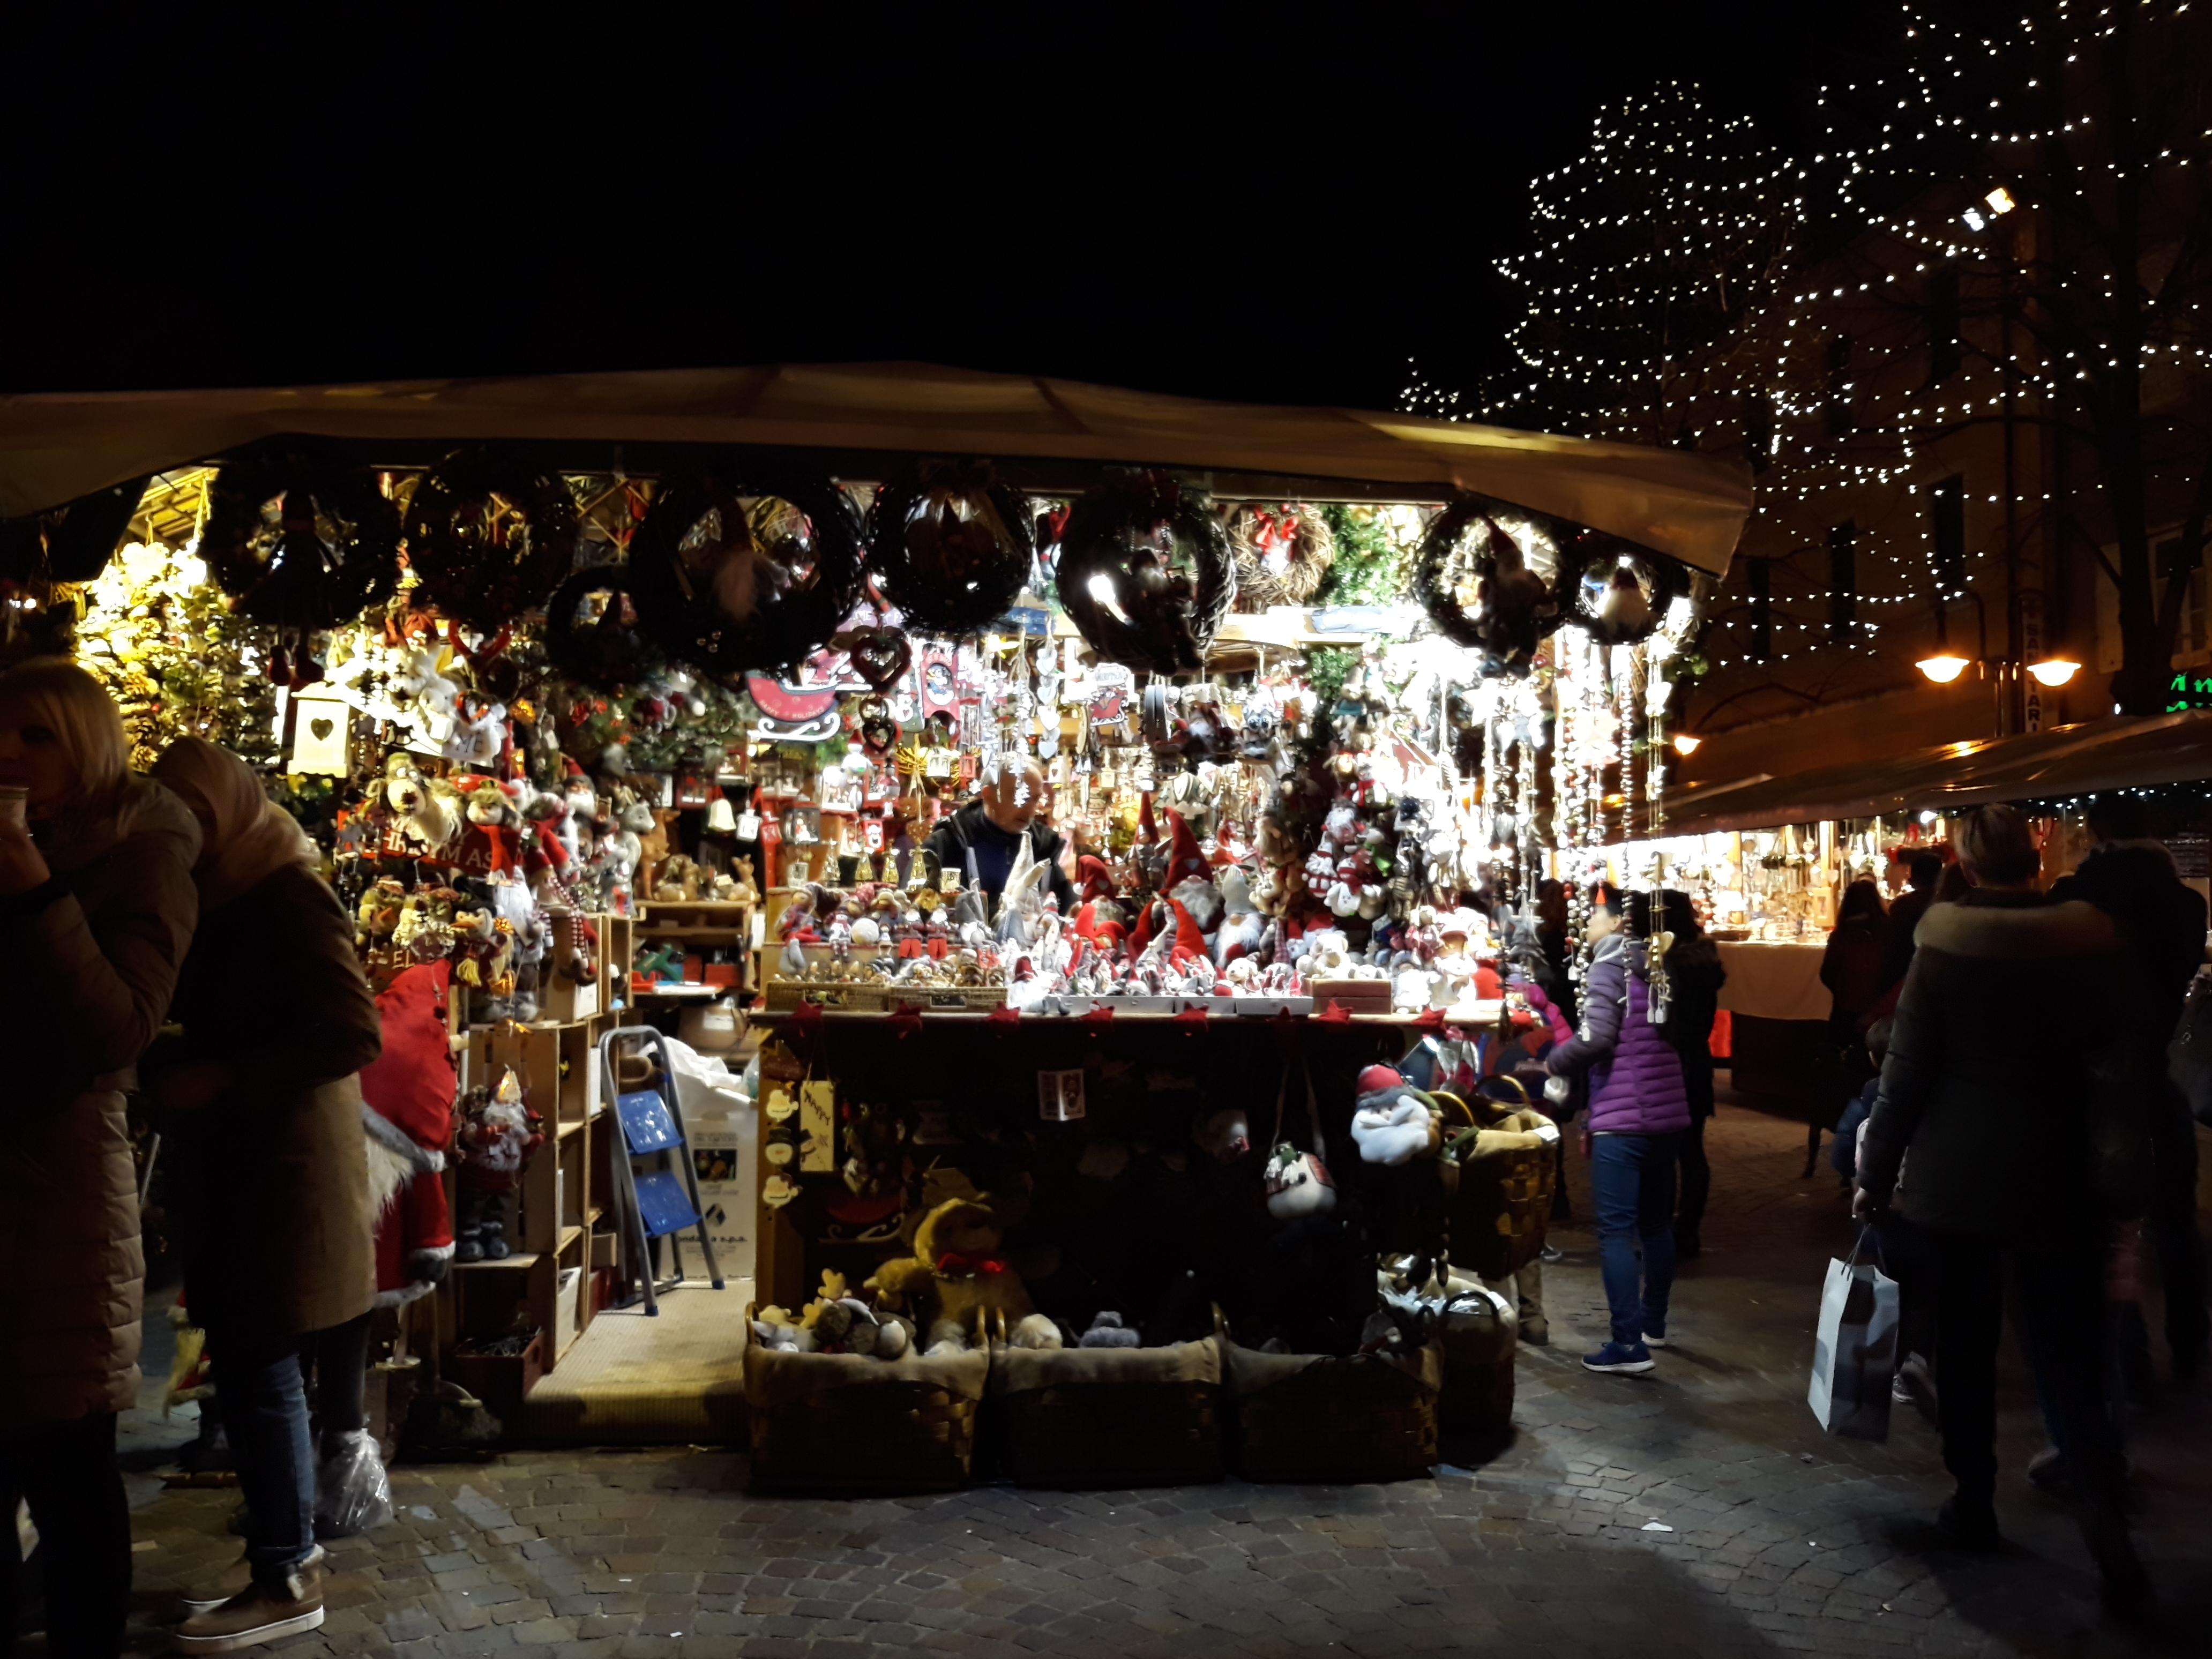 Immagini Di Mercatini Di Natale.File Trento Mercatini Di Natale 18 Nov 2017 Bottega Jpg Wikimedia Commons